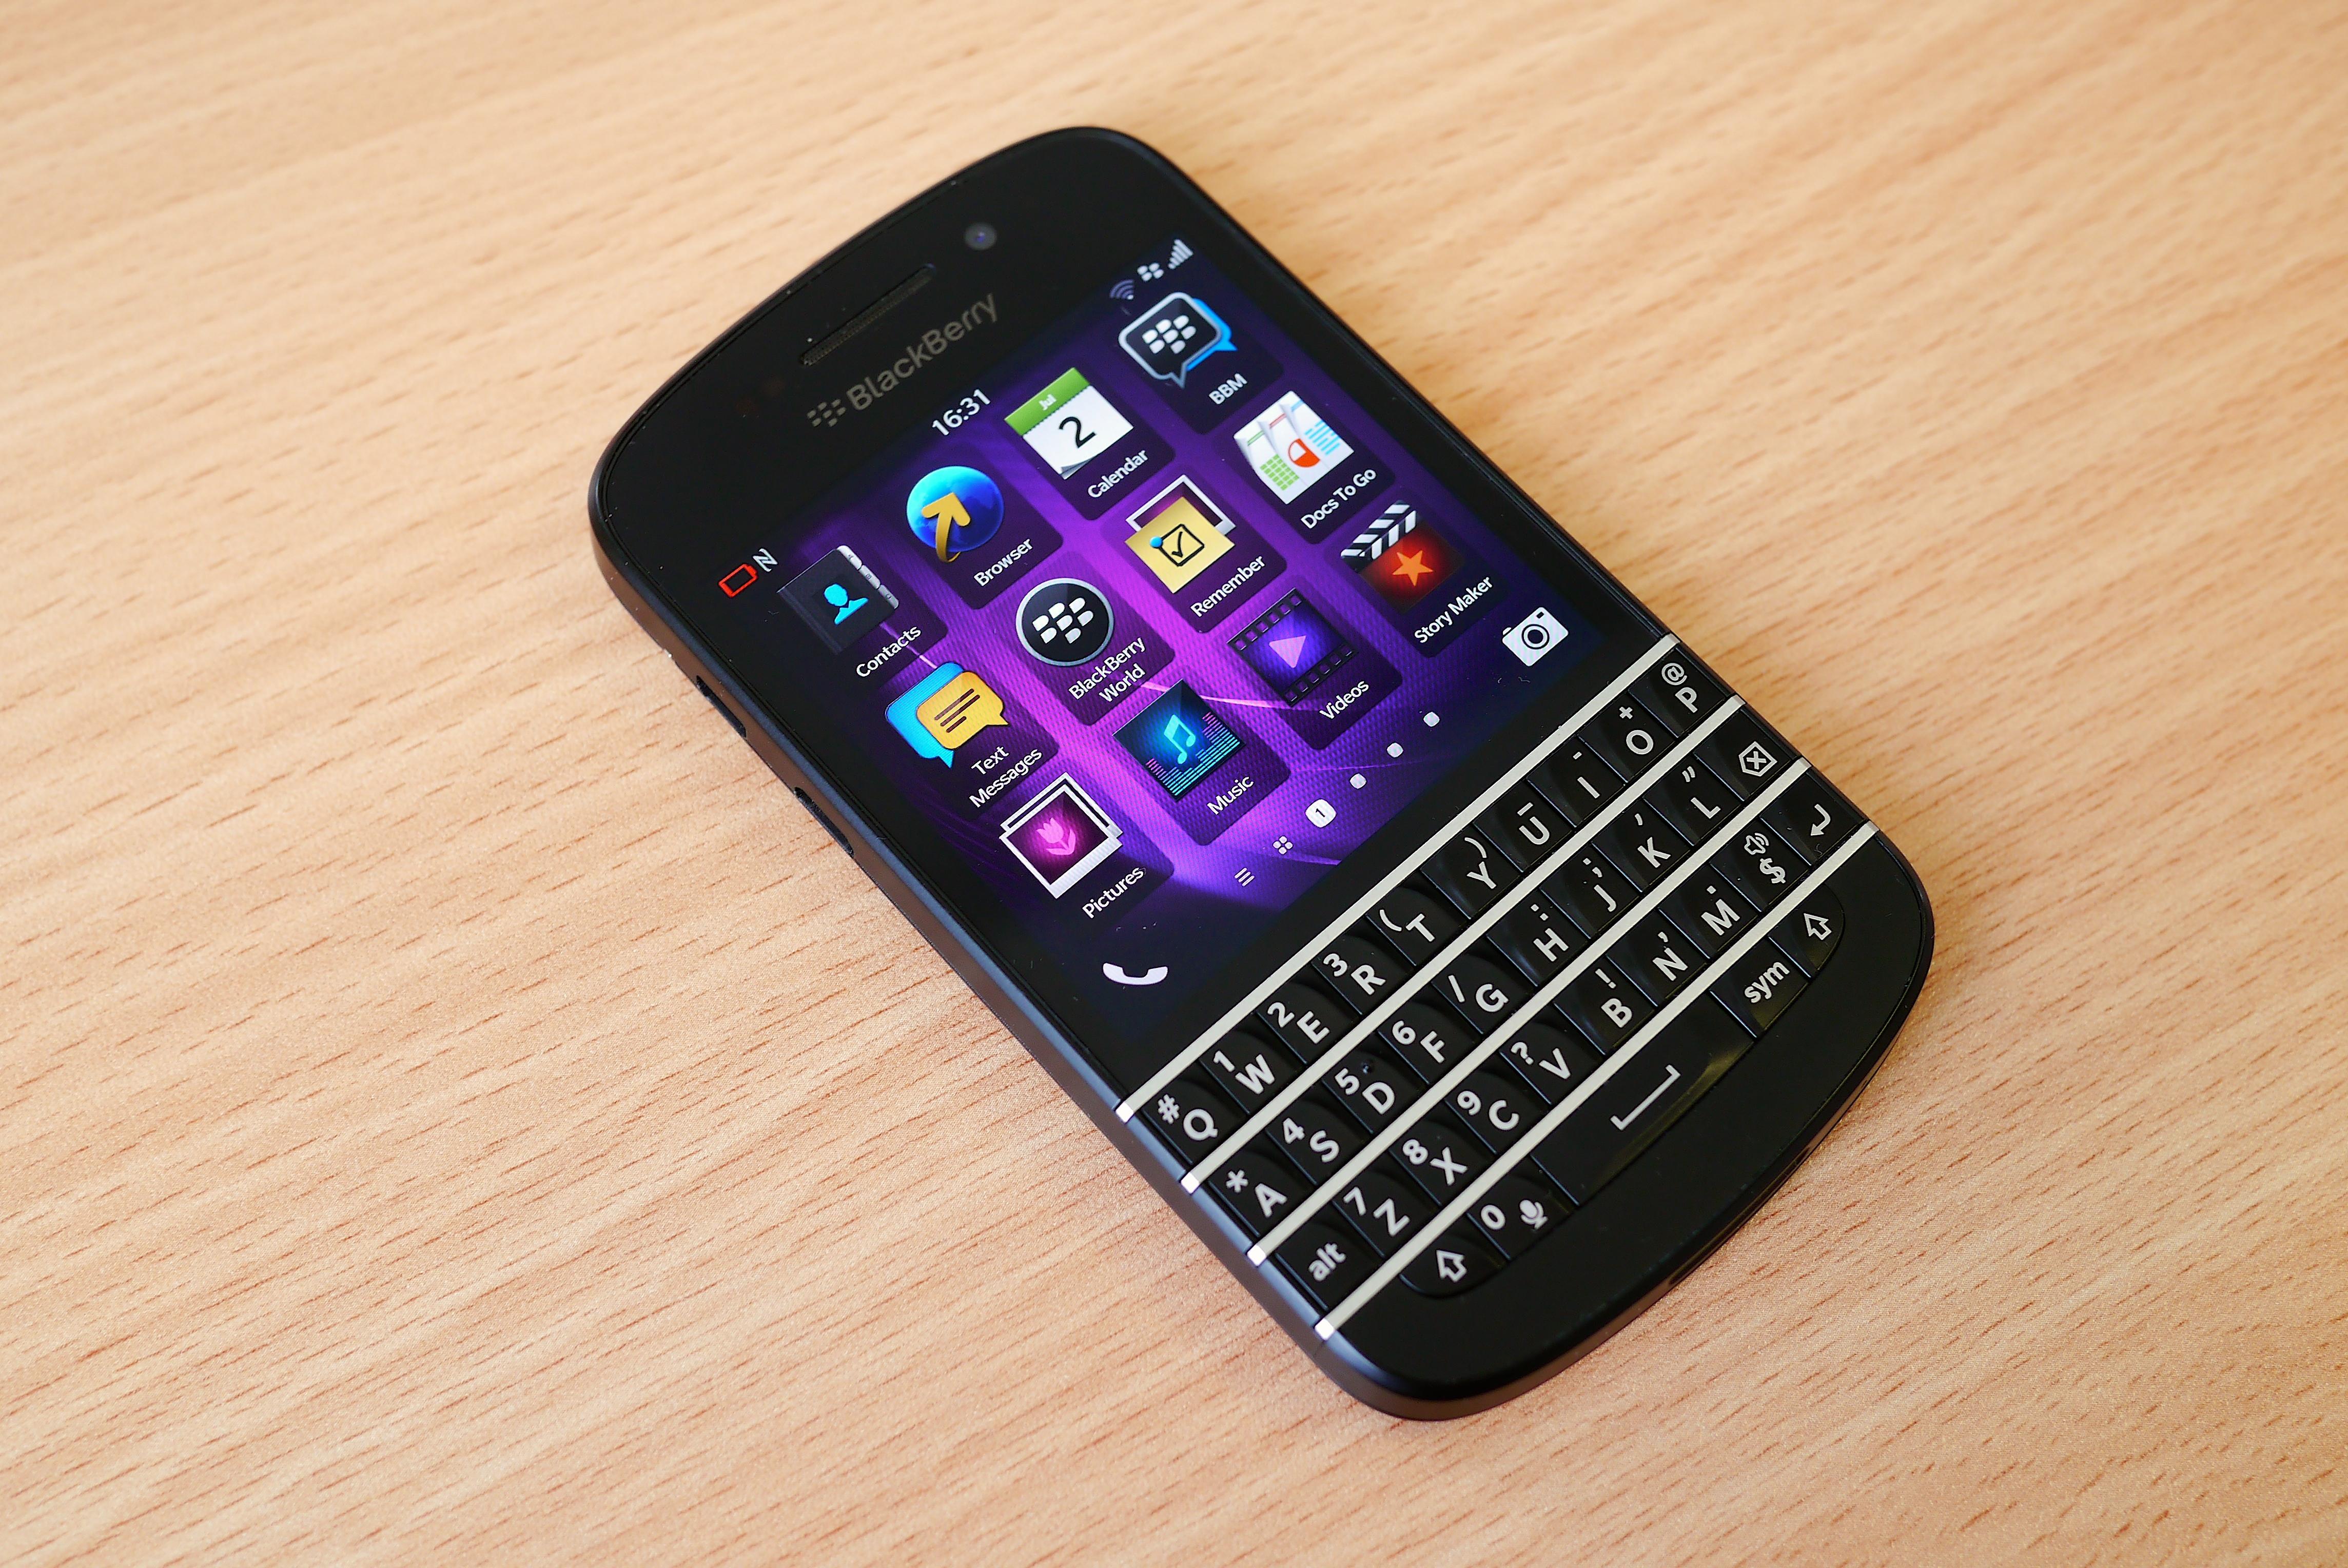 Blackberry_Q10_home_screen (1)